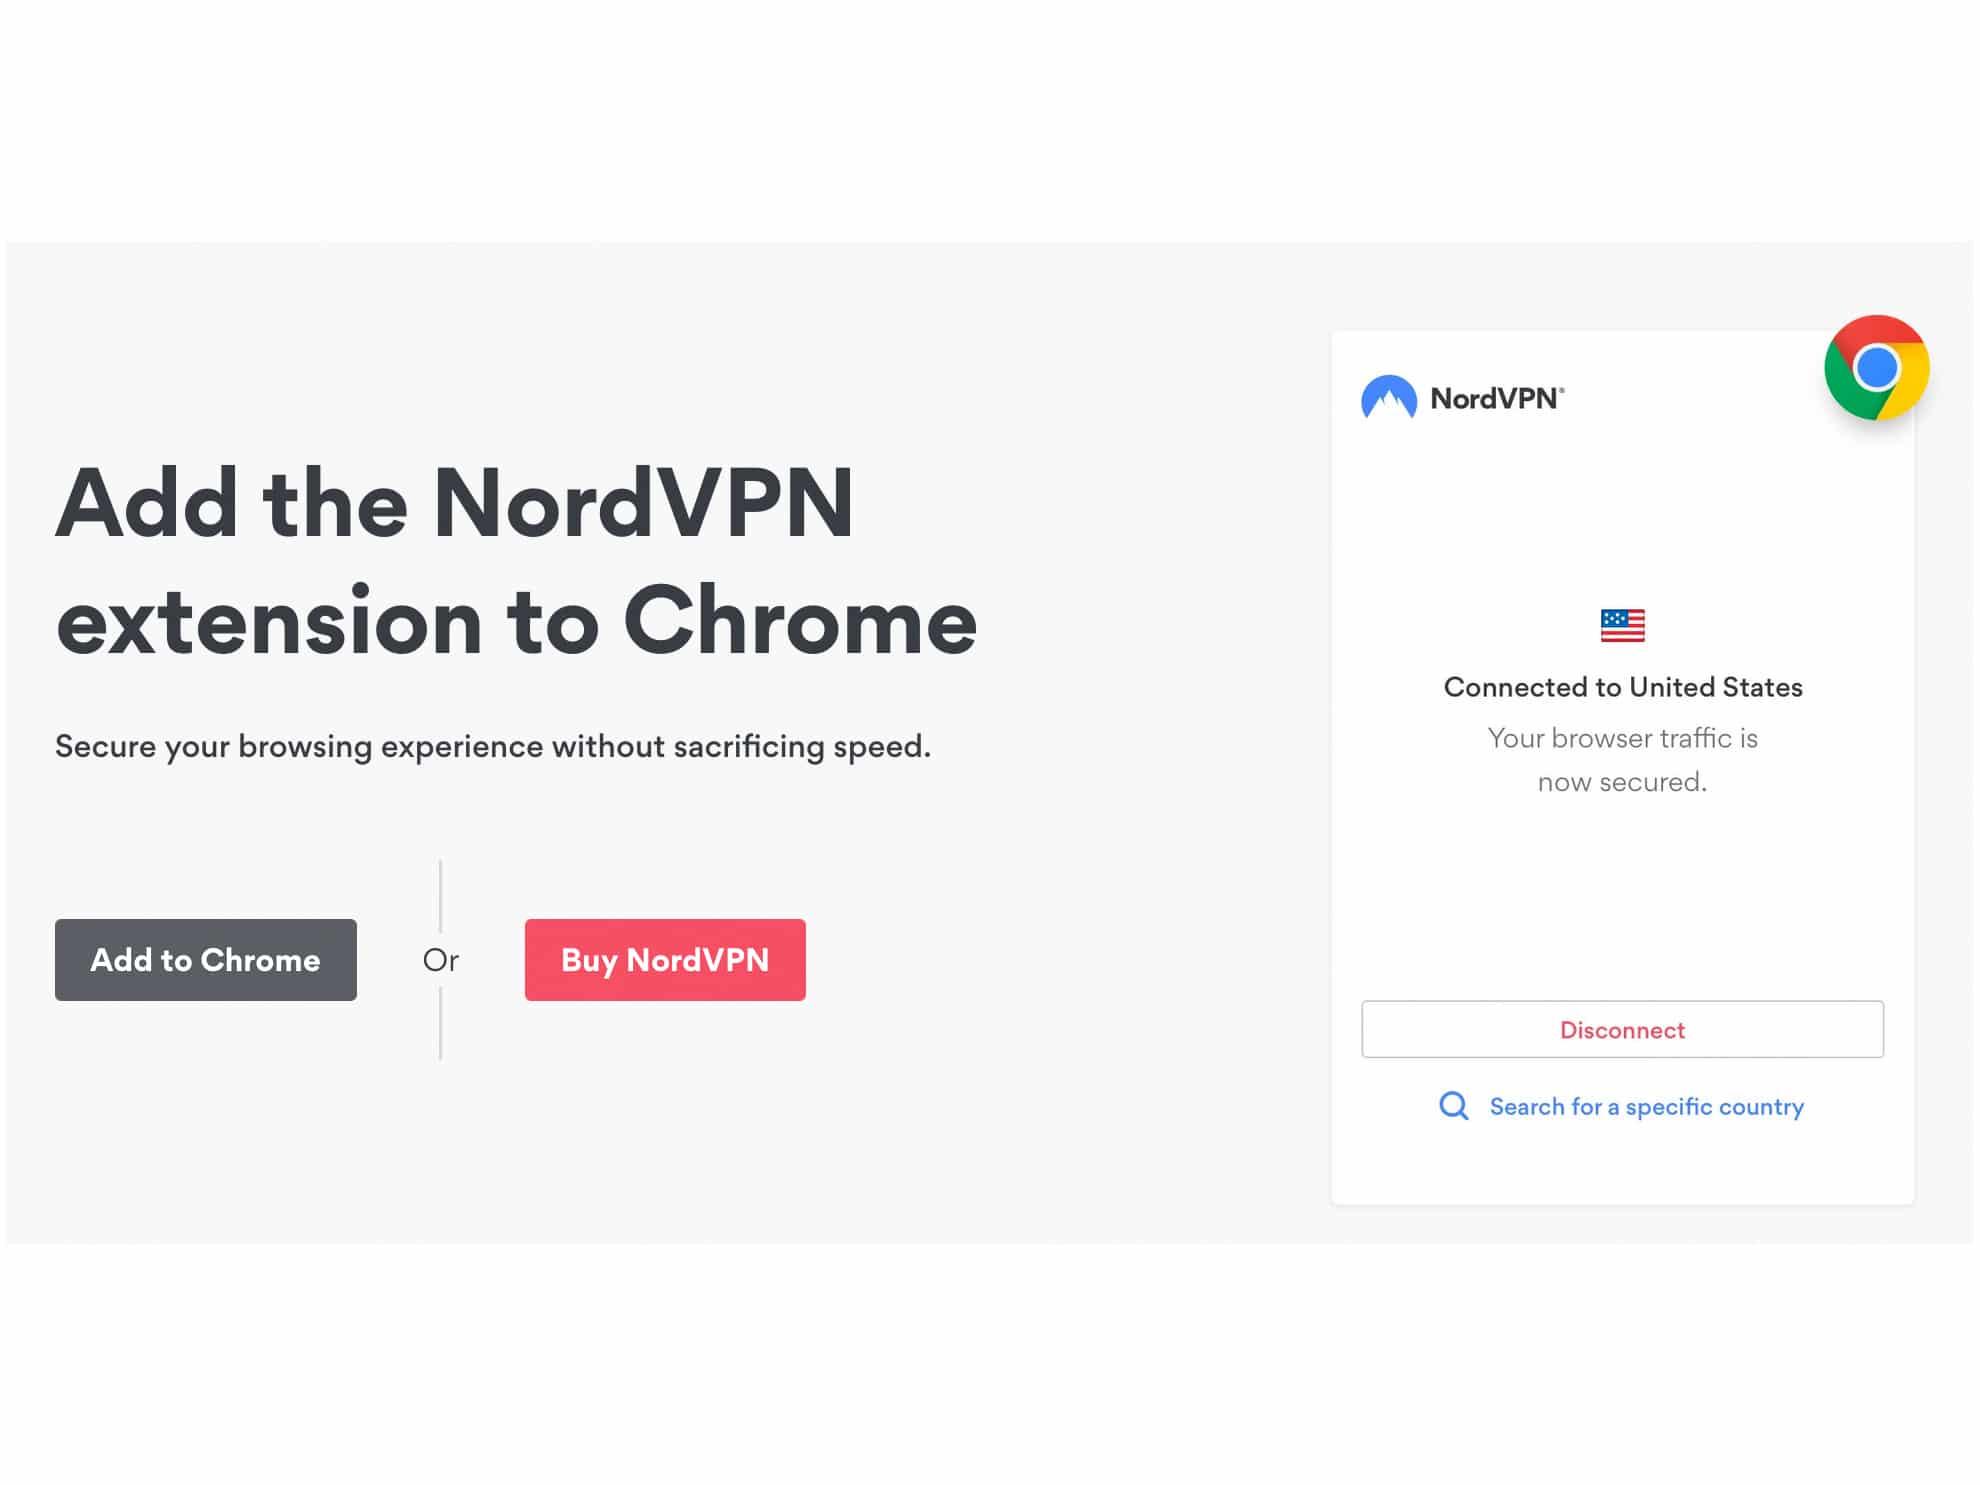 NordVPN Chrome extension